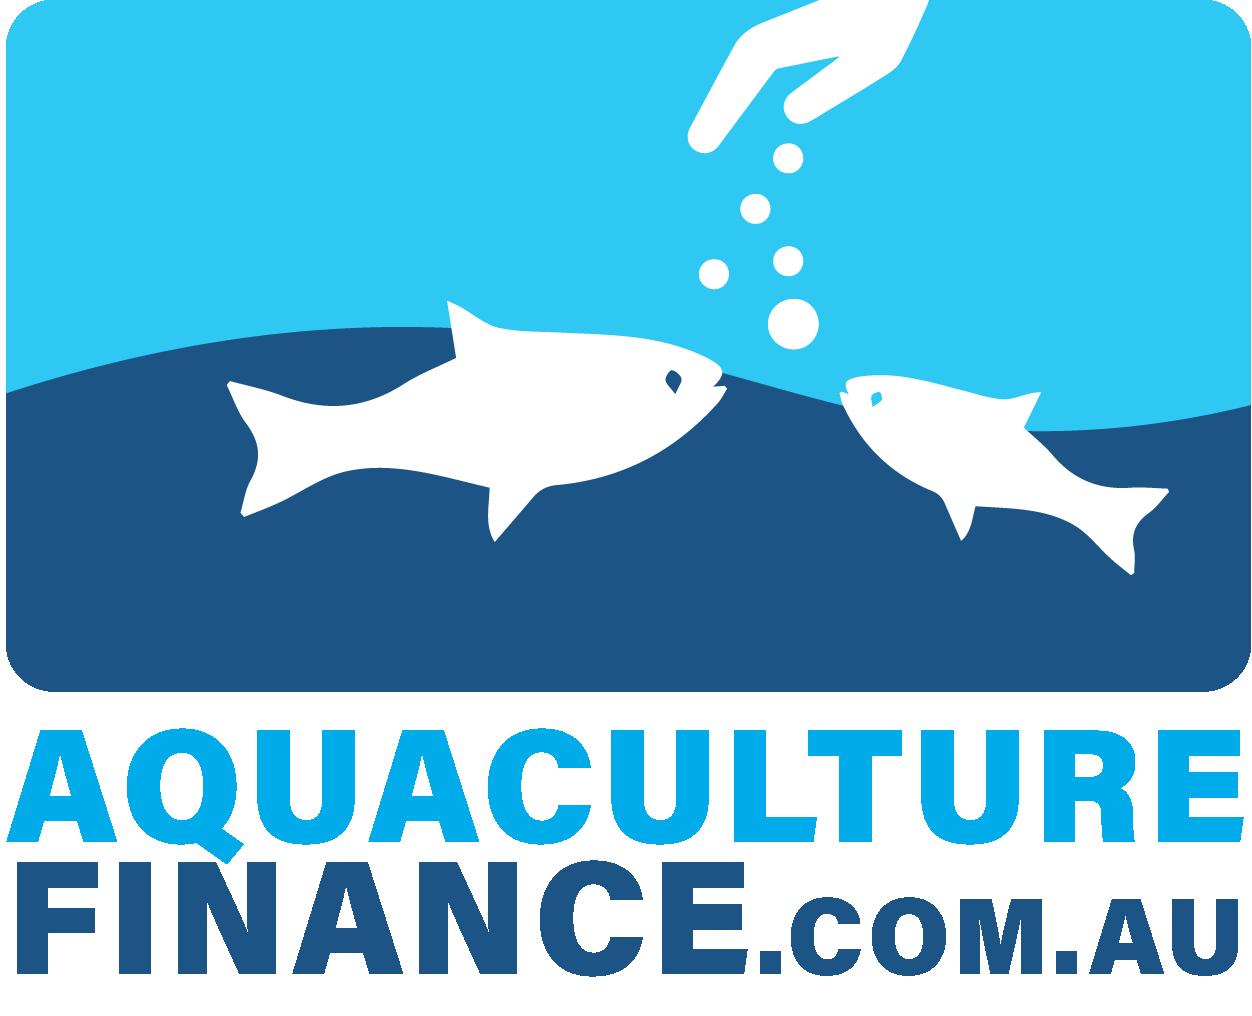 AquacultureFinance logo